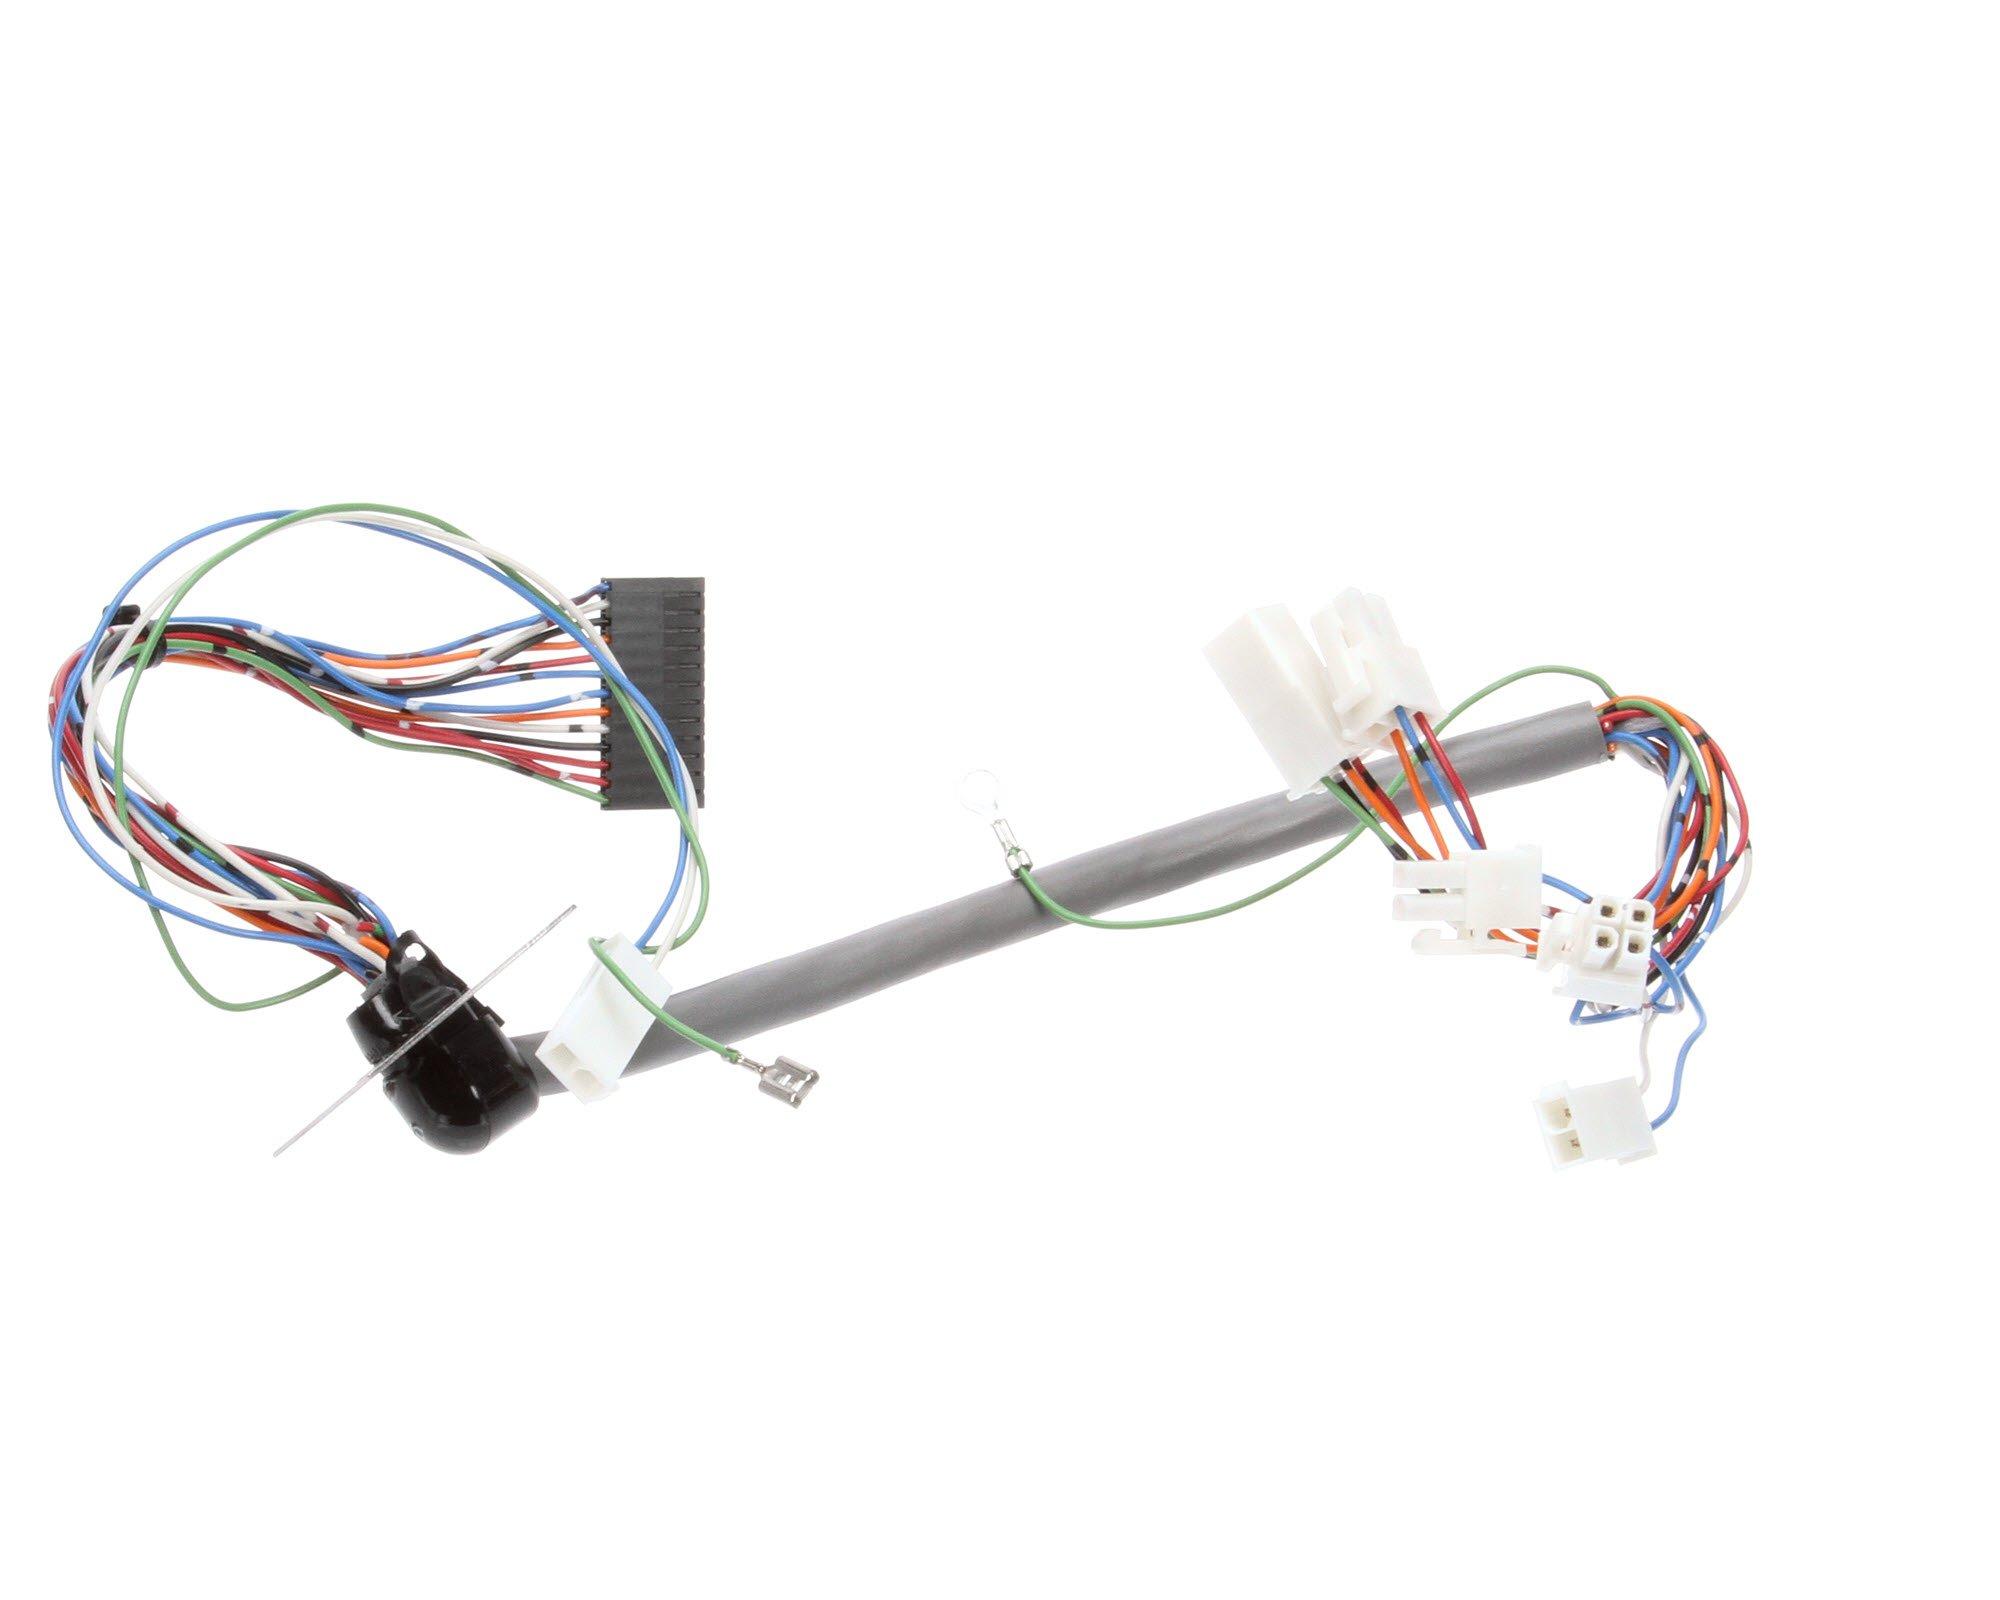 Bunn 29066.0001 Wiring Harness